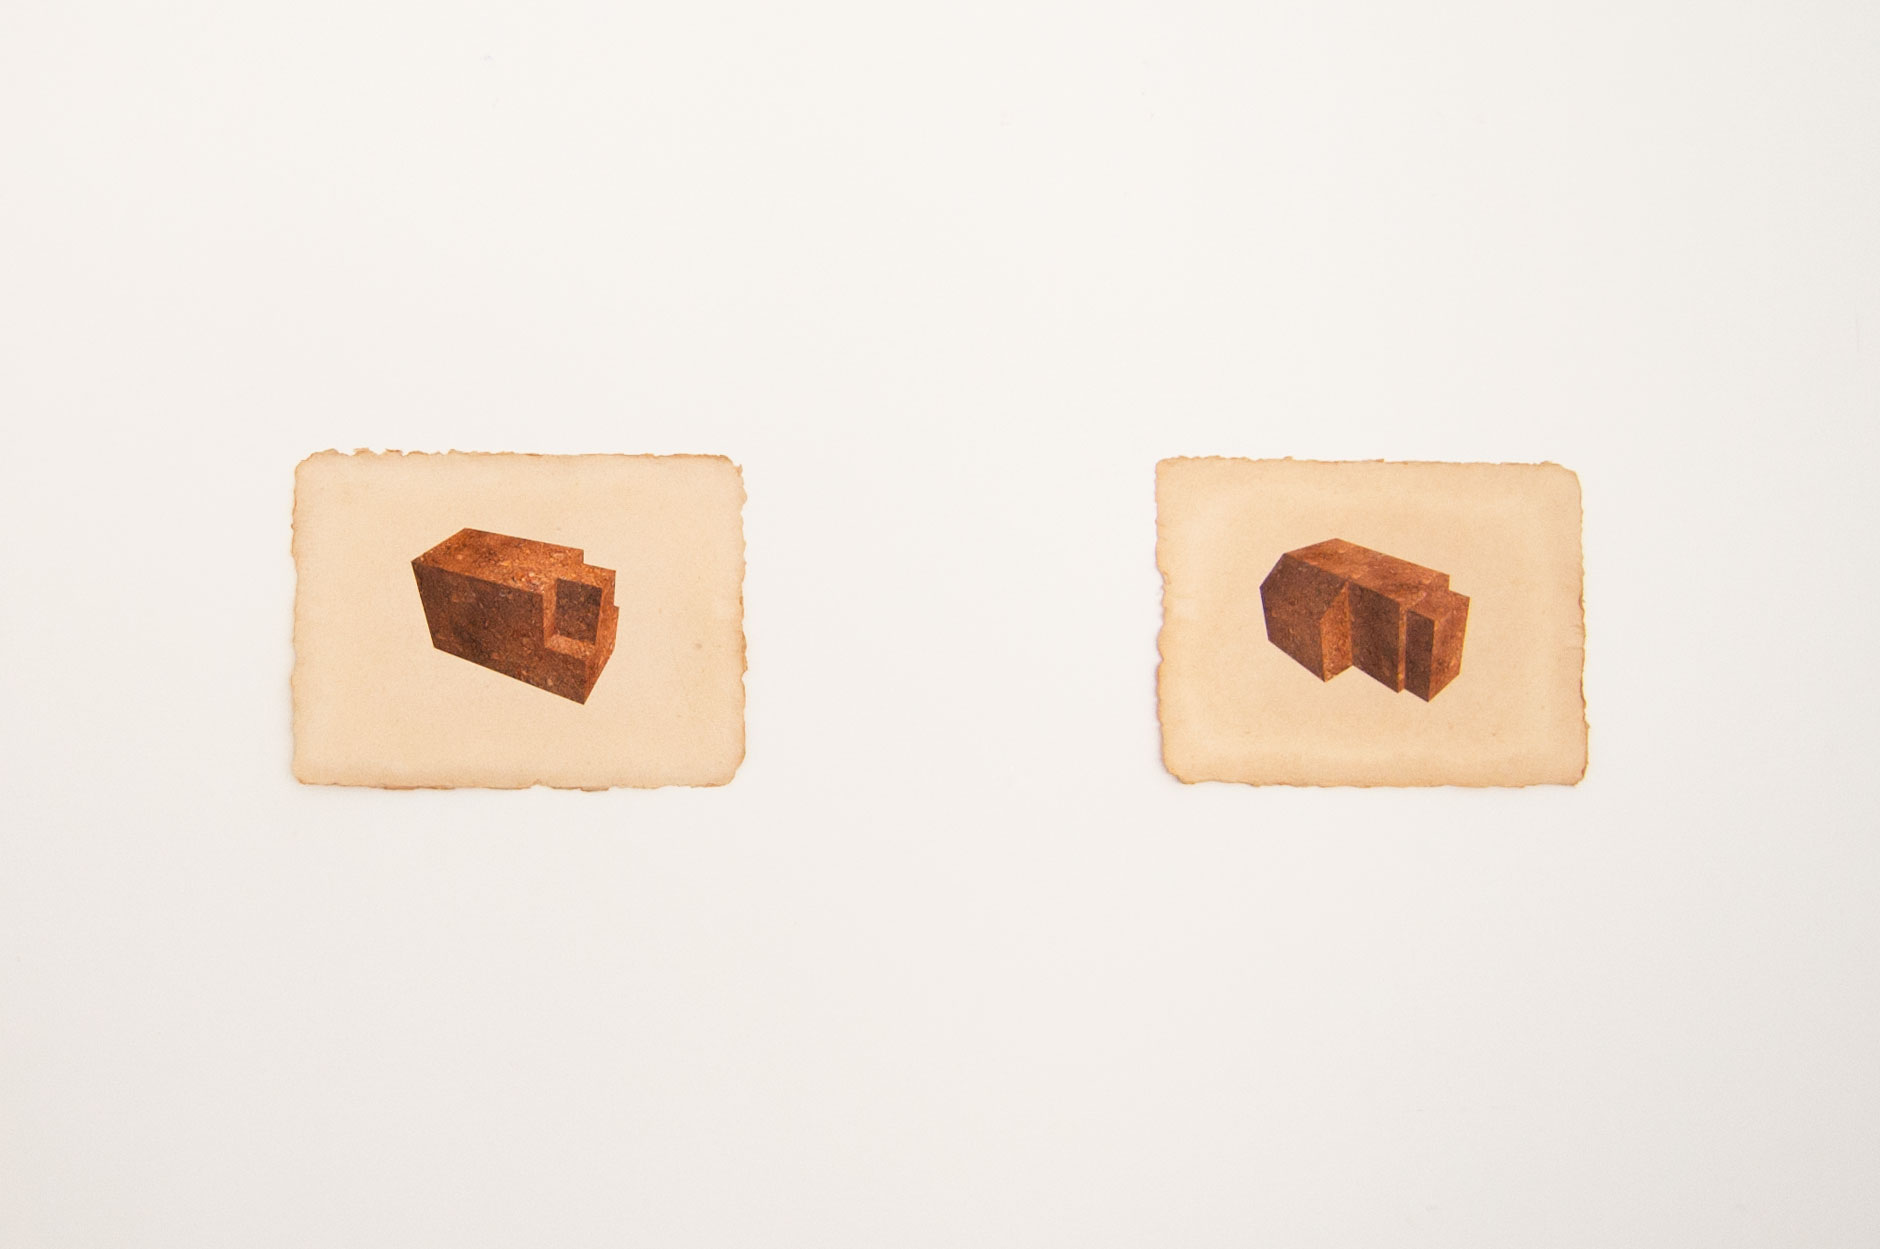 Peat Suite (Hermitages) , peat structures rendered using CAD, digital prints on handmade paper, 2014(photo: Kristin Reiman)